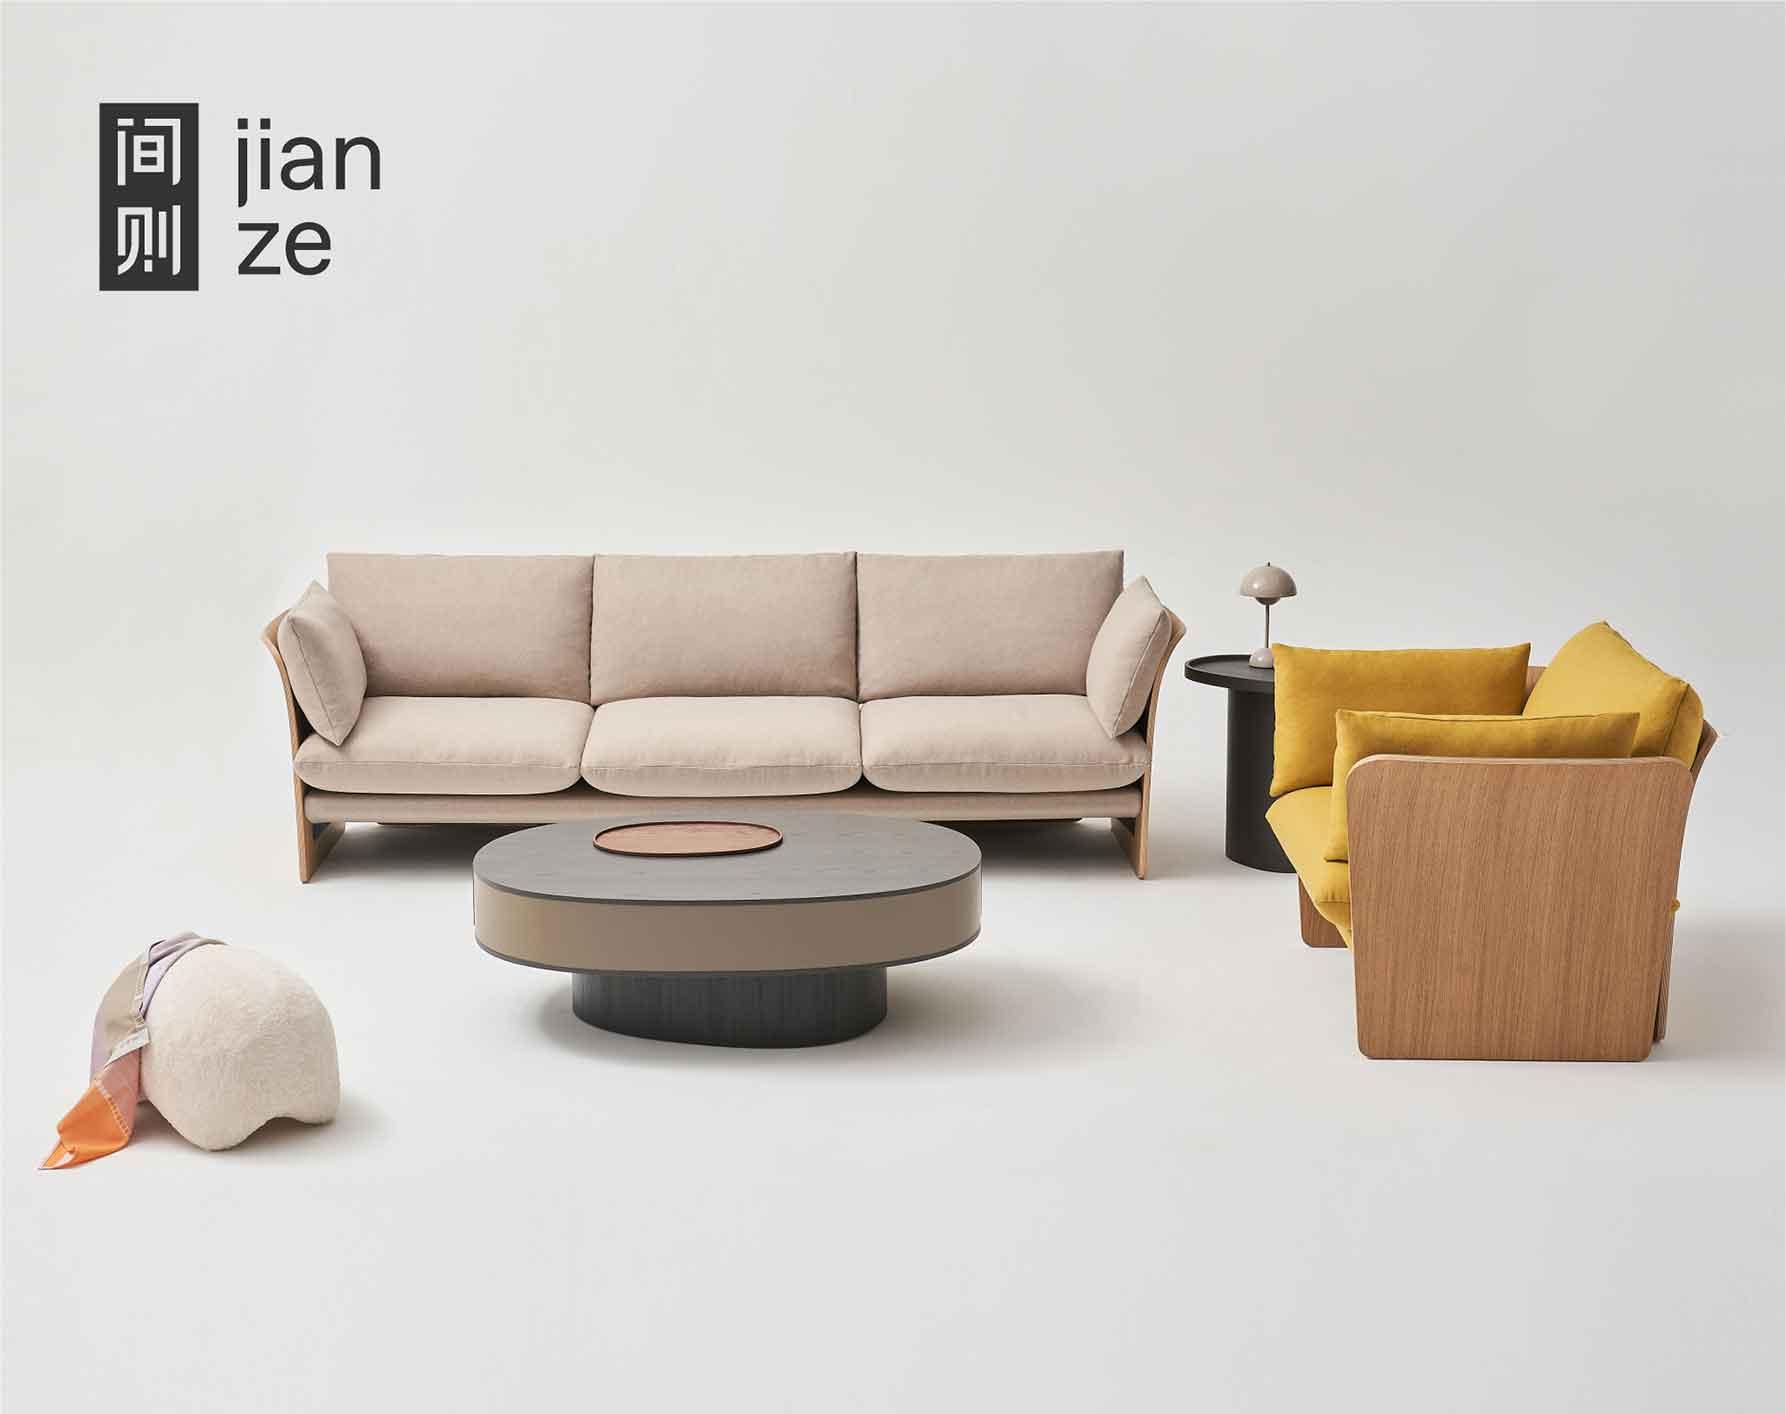 Jianze, Design Shanghai 2021